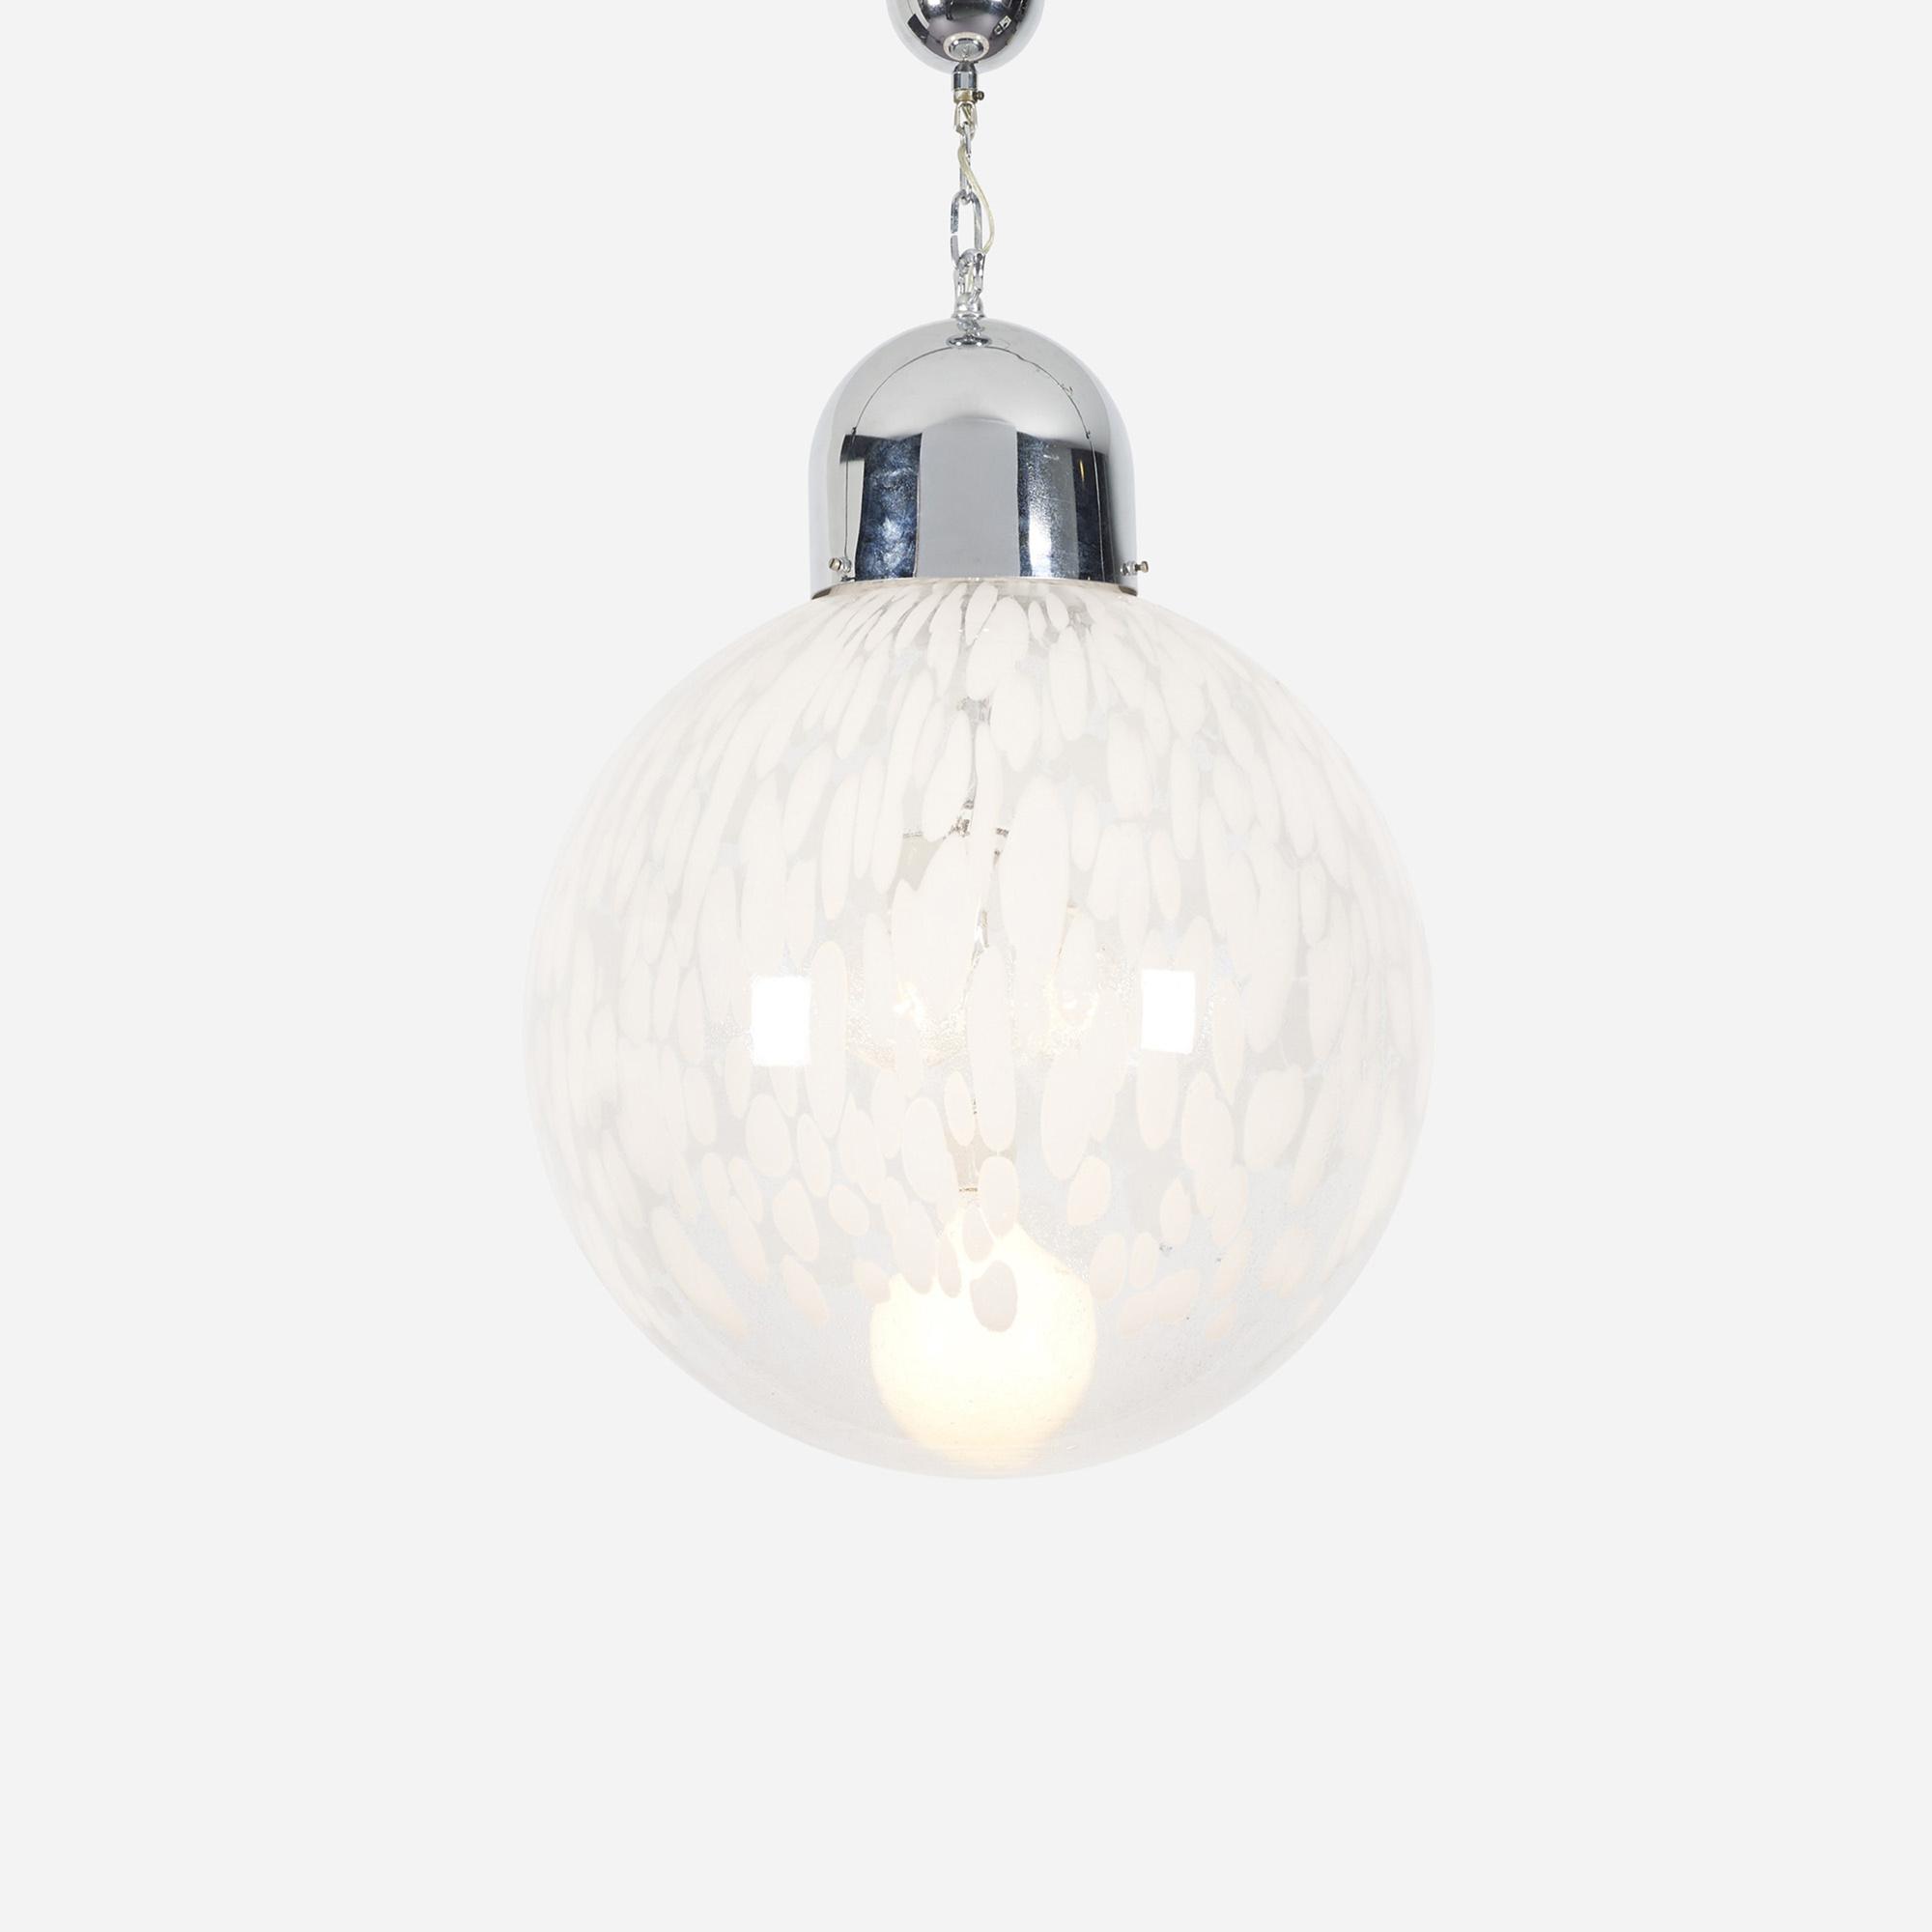 624: Murano / pendant lamp (1 of 1)